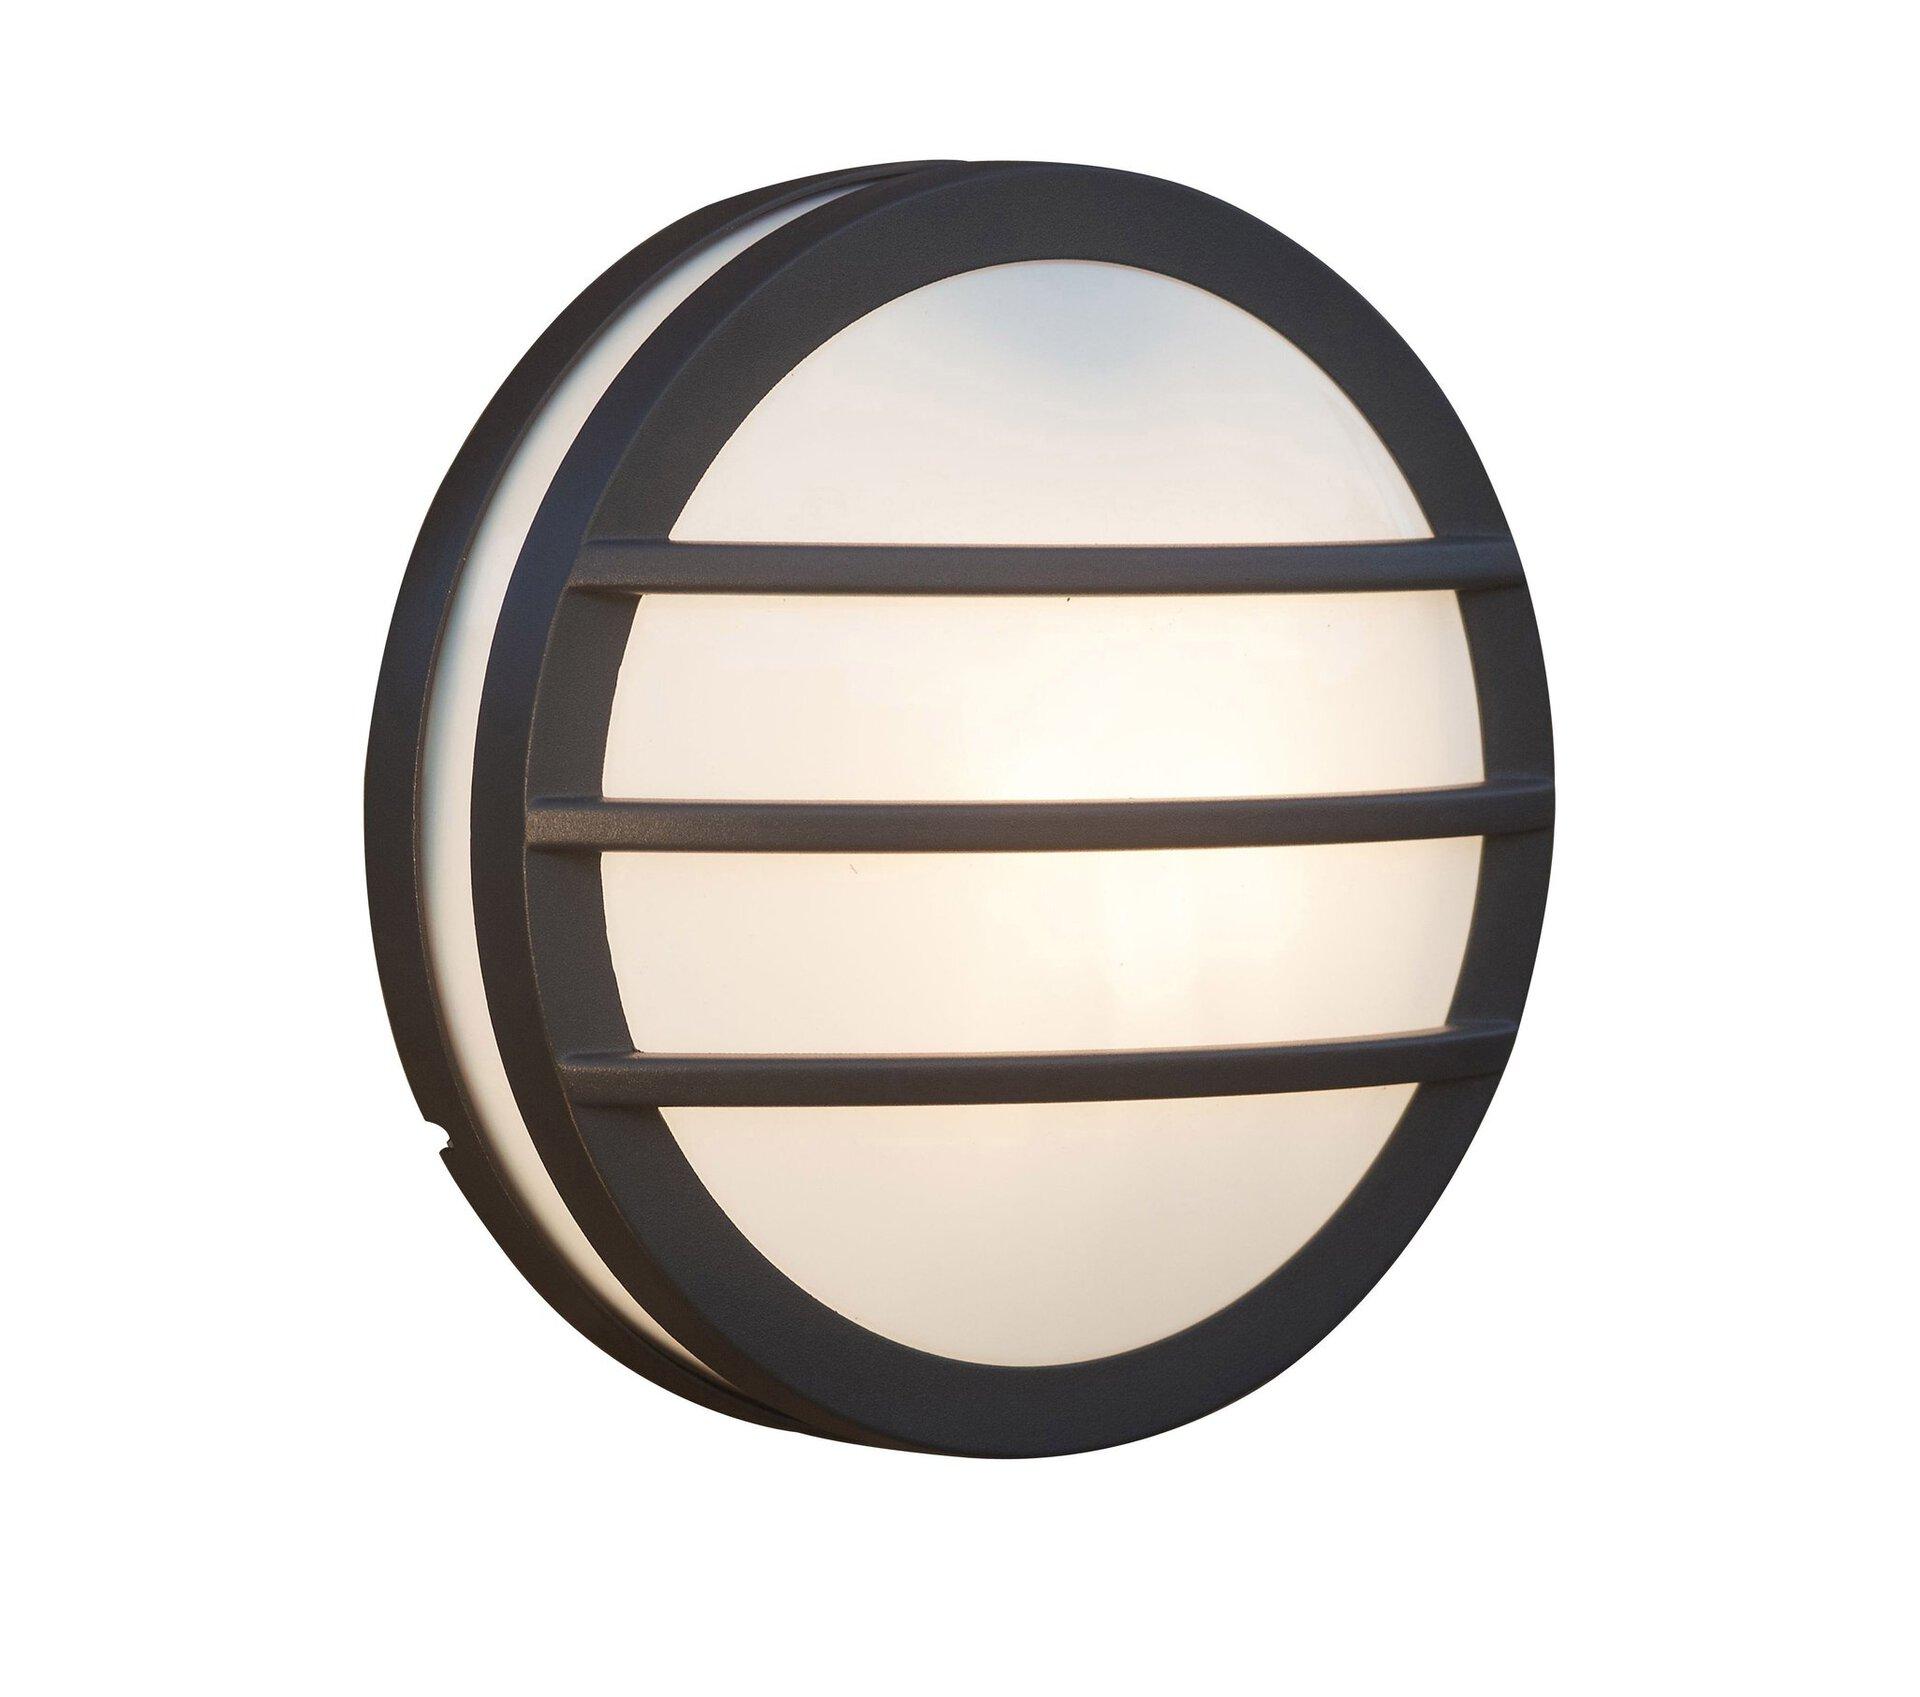 Wand-Aussenleuchte Seine Eco-Light Metall grau 26 x 10 x 26 cm